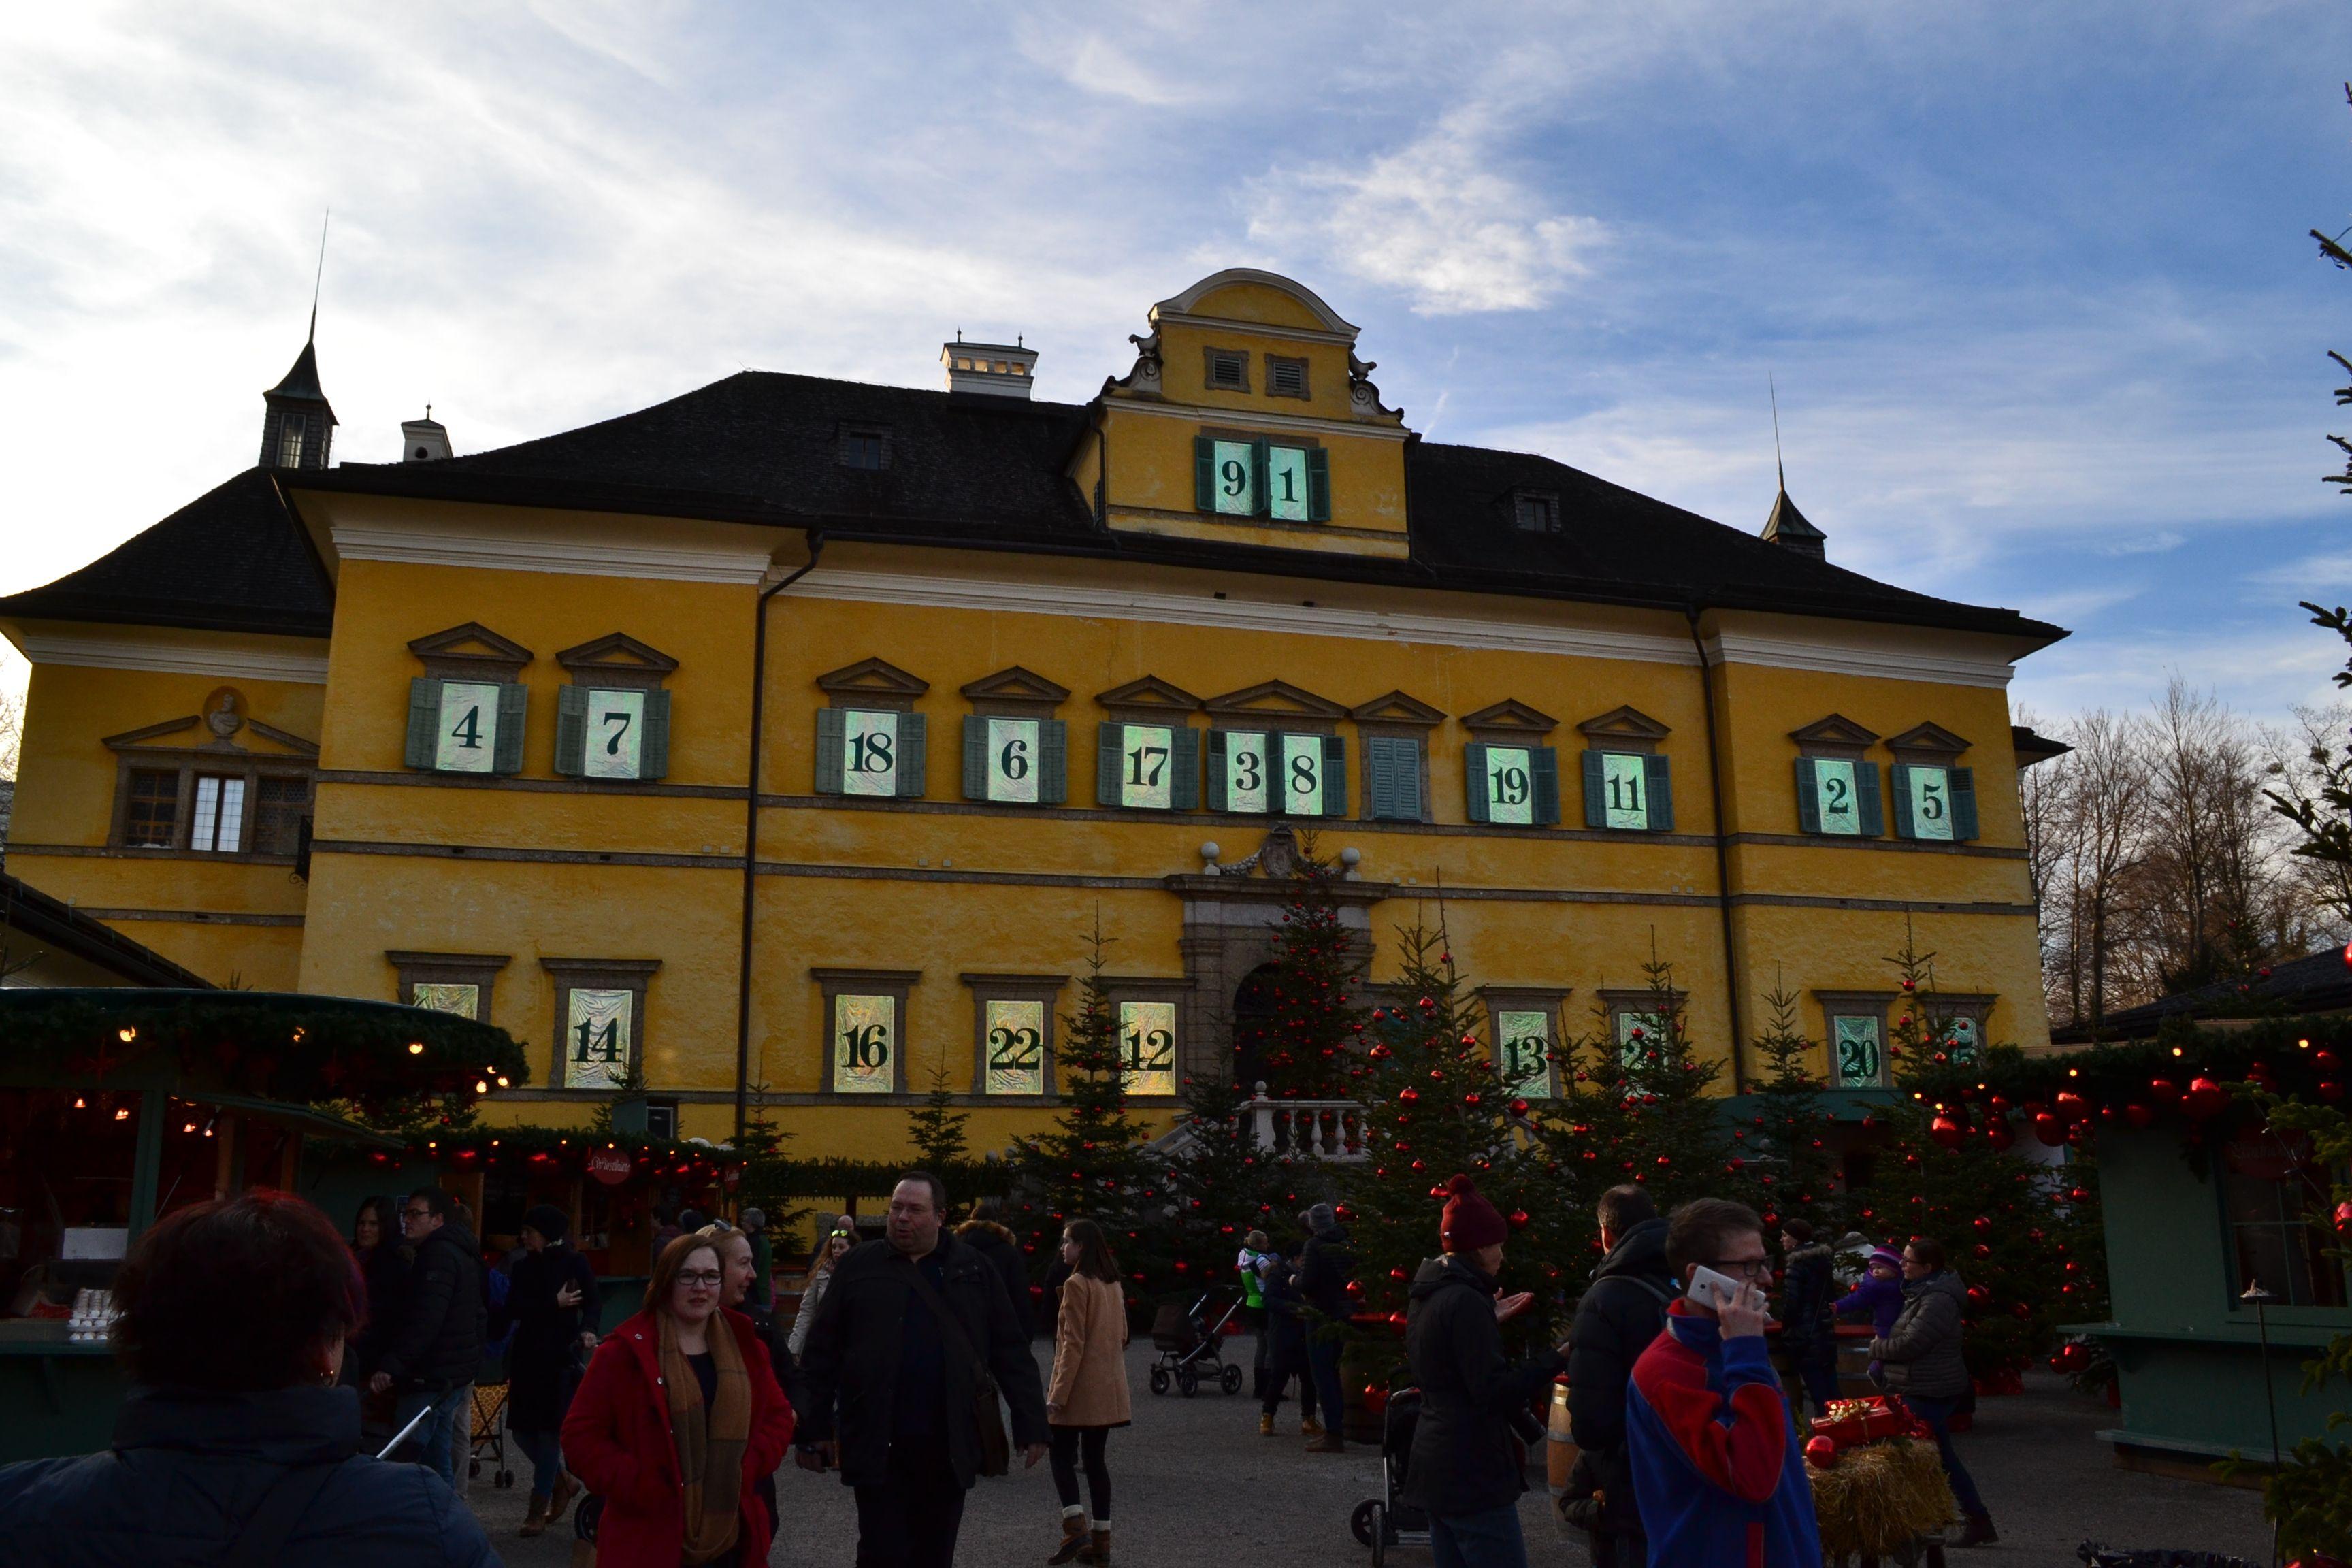 Hellbrunn Palace Christmas Market | Christmas market, Outdoor theater, House styles